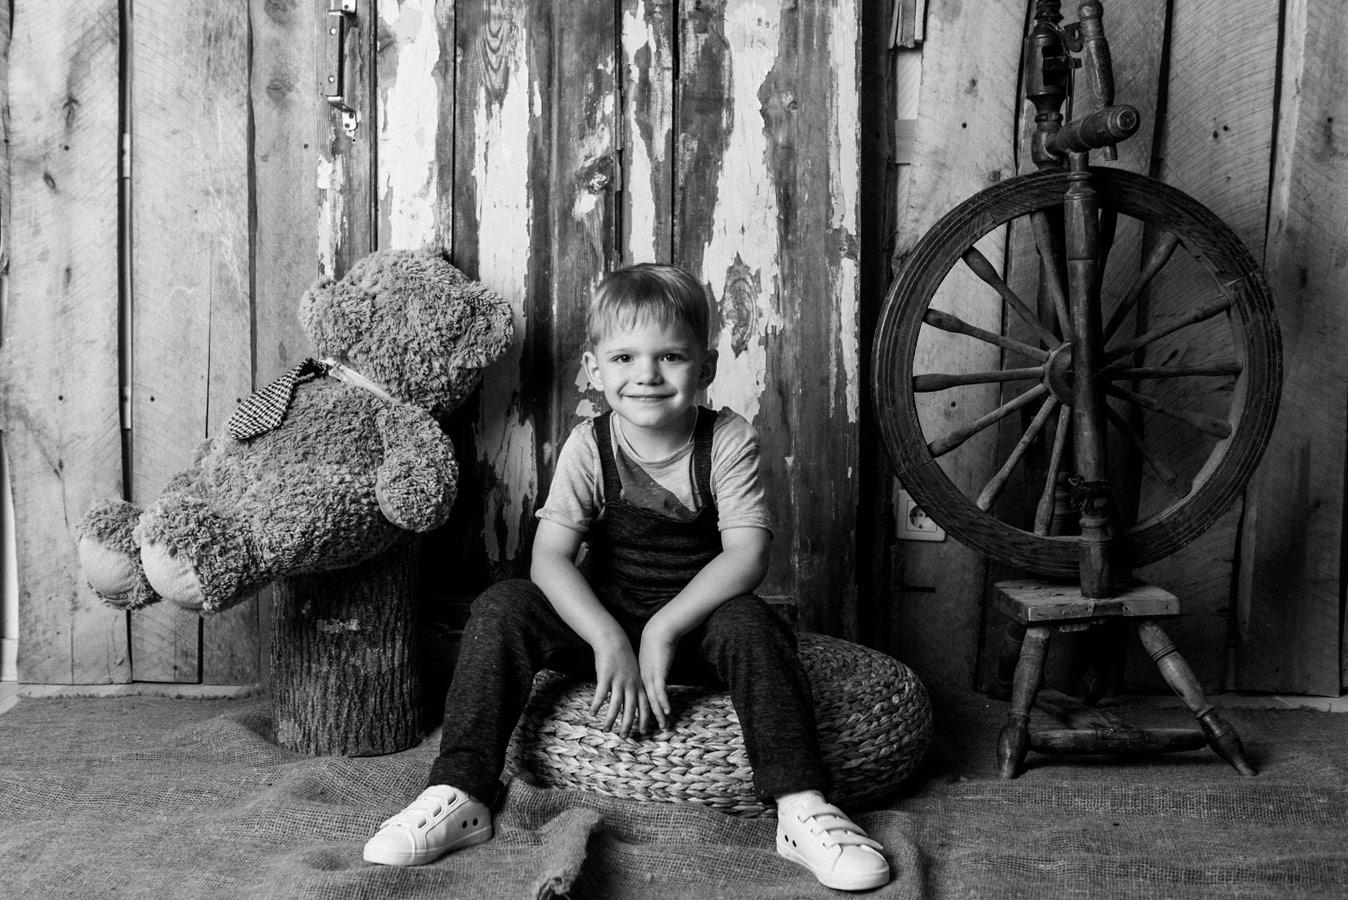 Моё детство, © Роман Иванов, Фотоконкурс Family Russian Photo Award журнала «Российское фото»